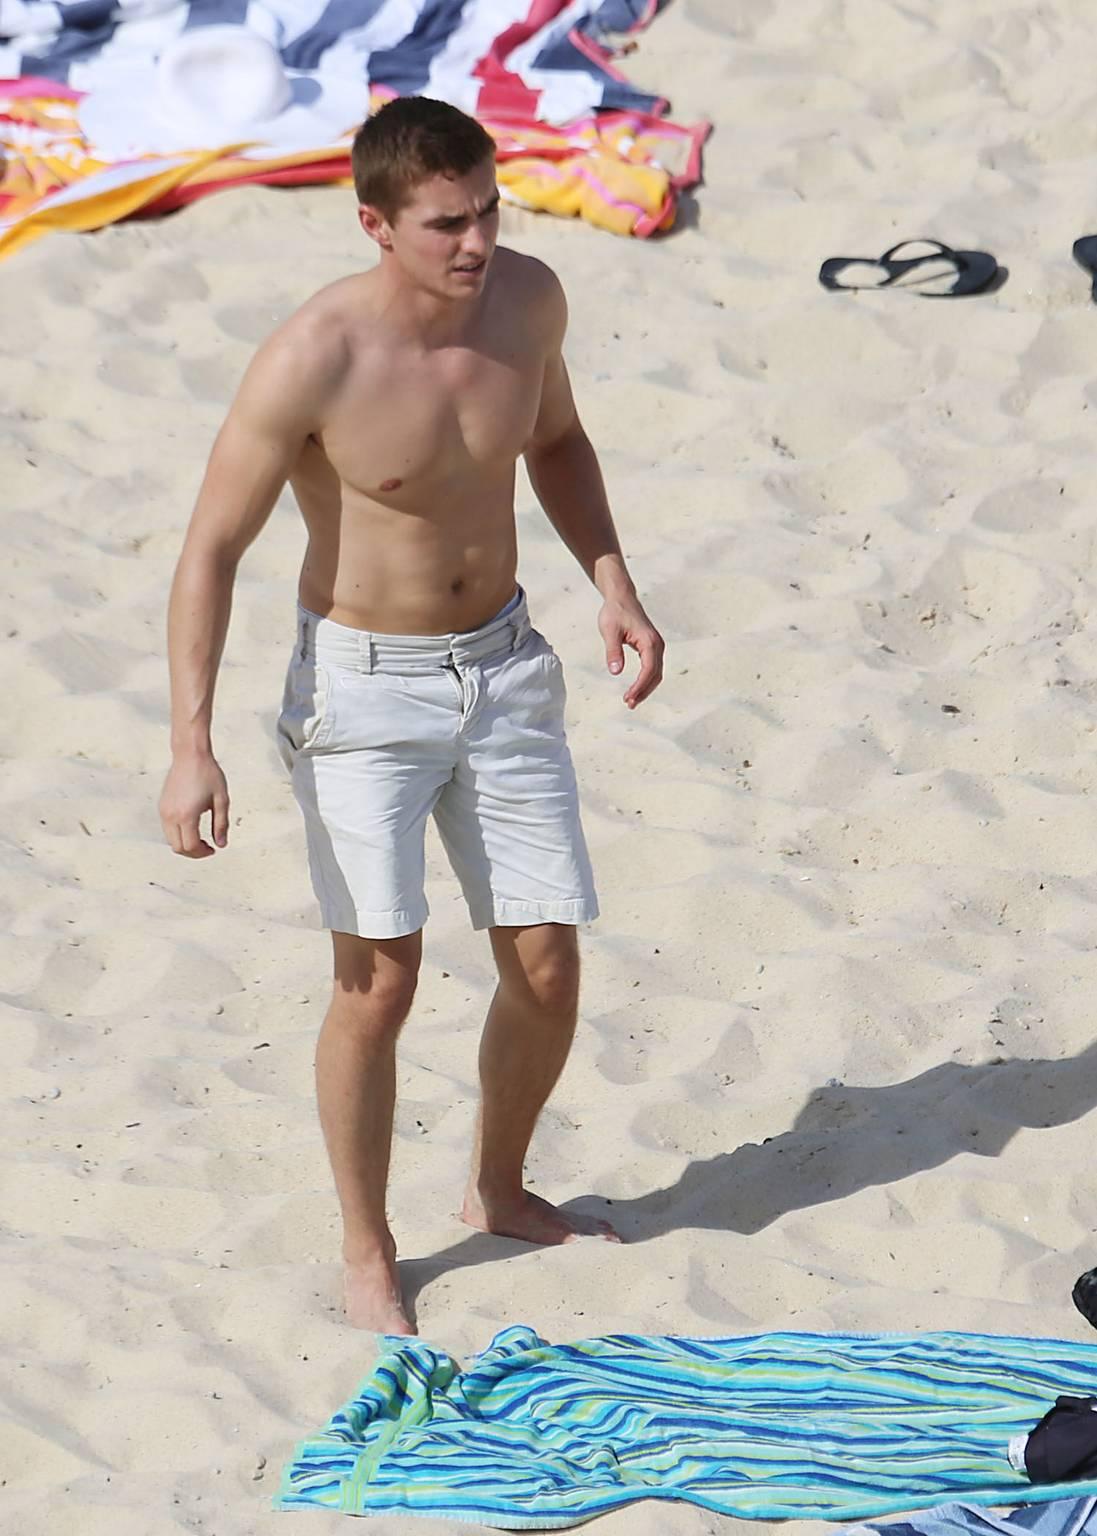 dave franco new shirtless barefoot pics